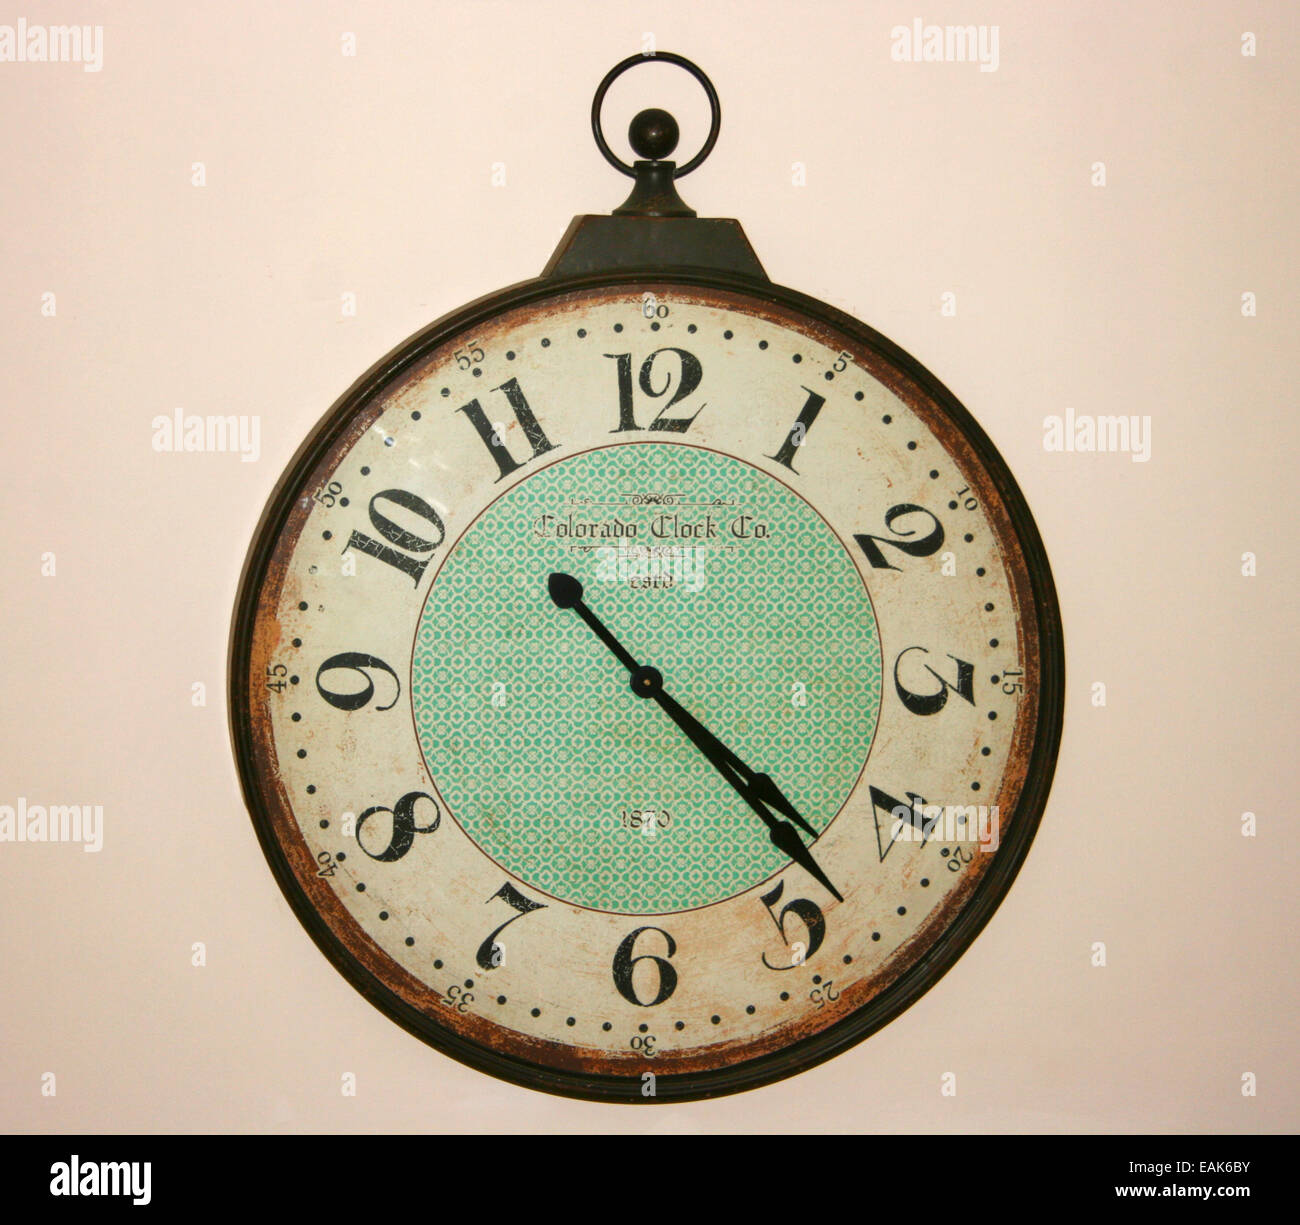 Vintage Wall Clock - Stock Image